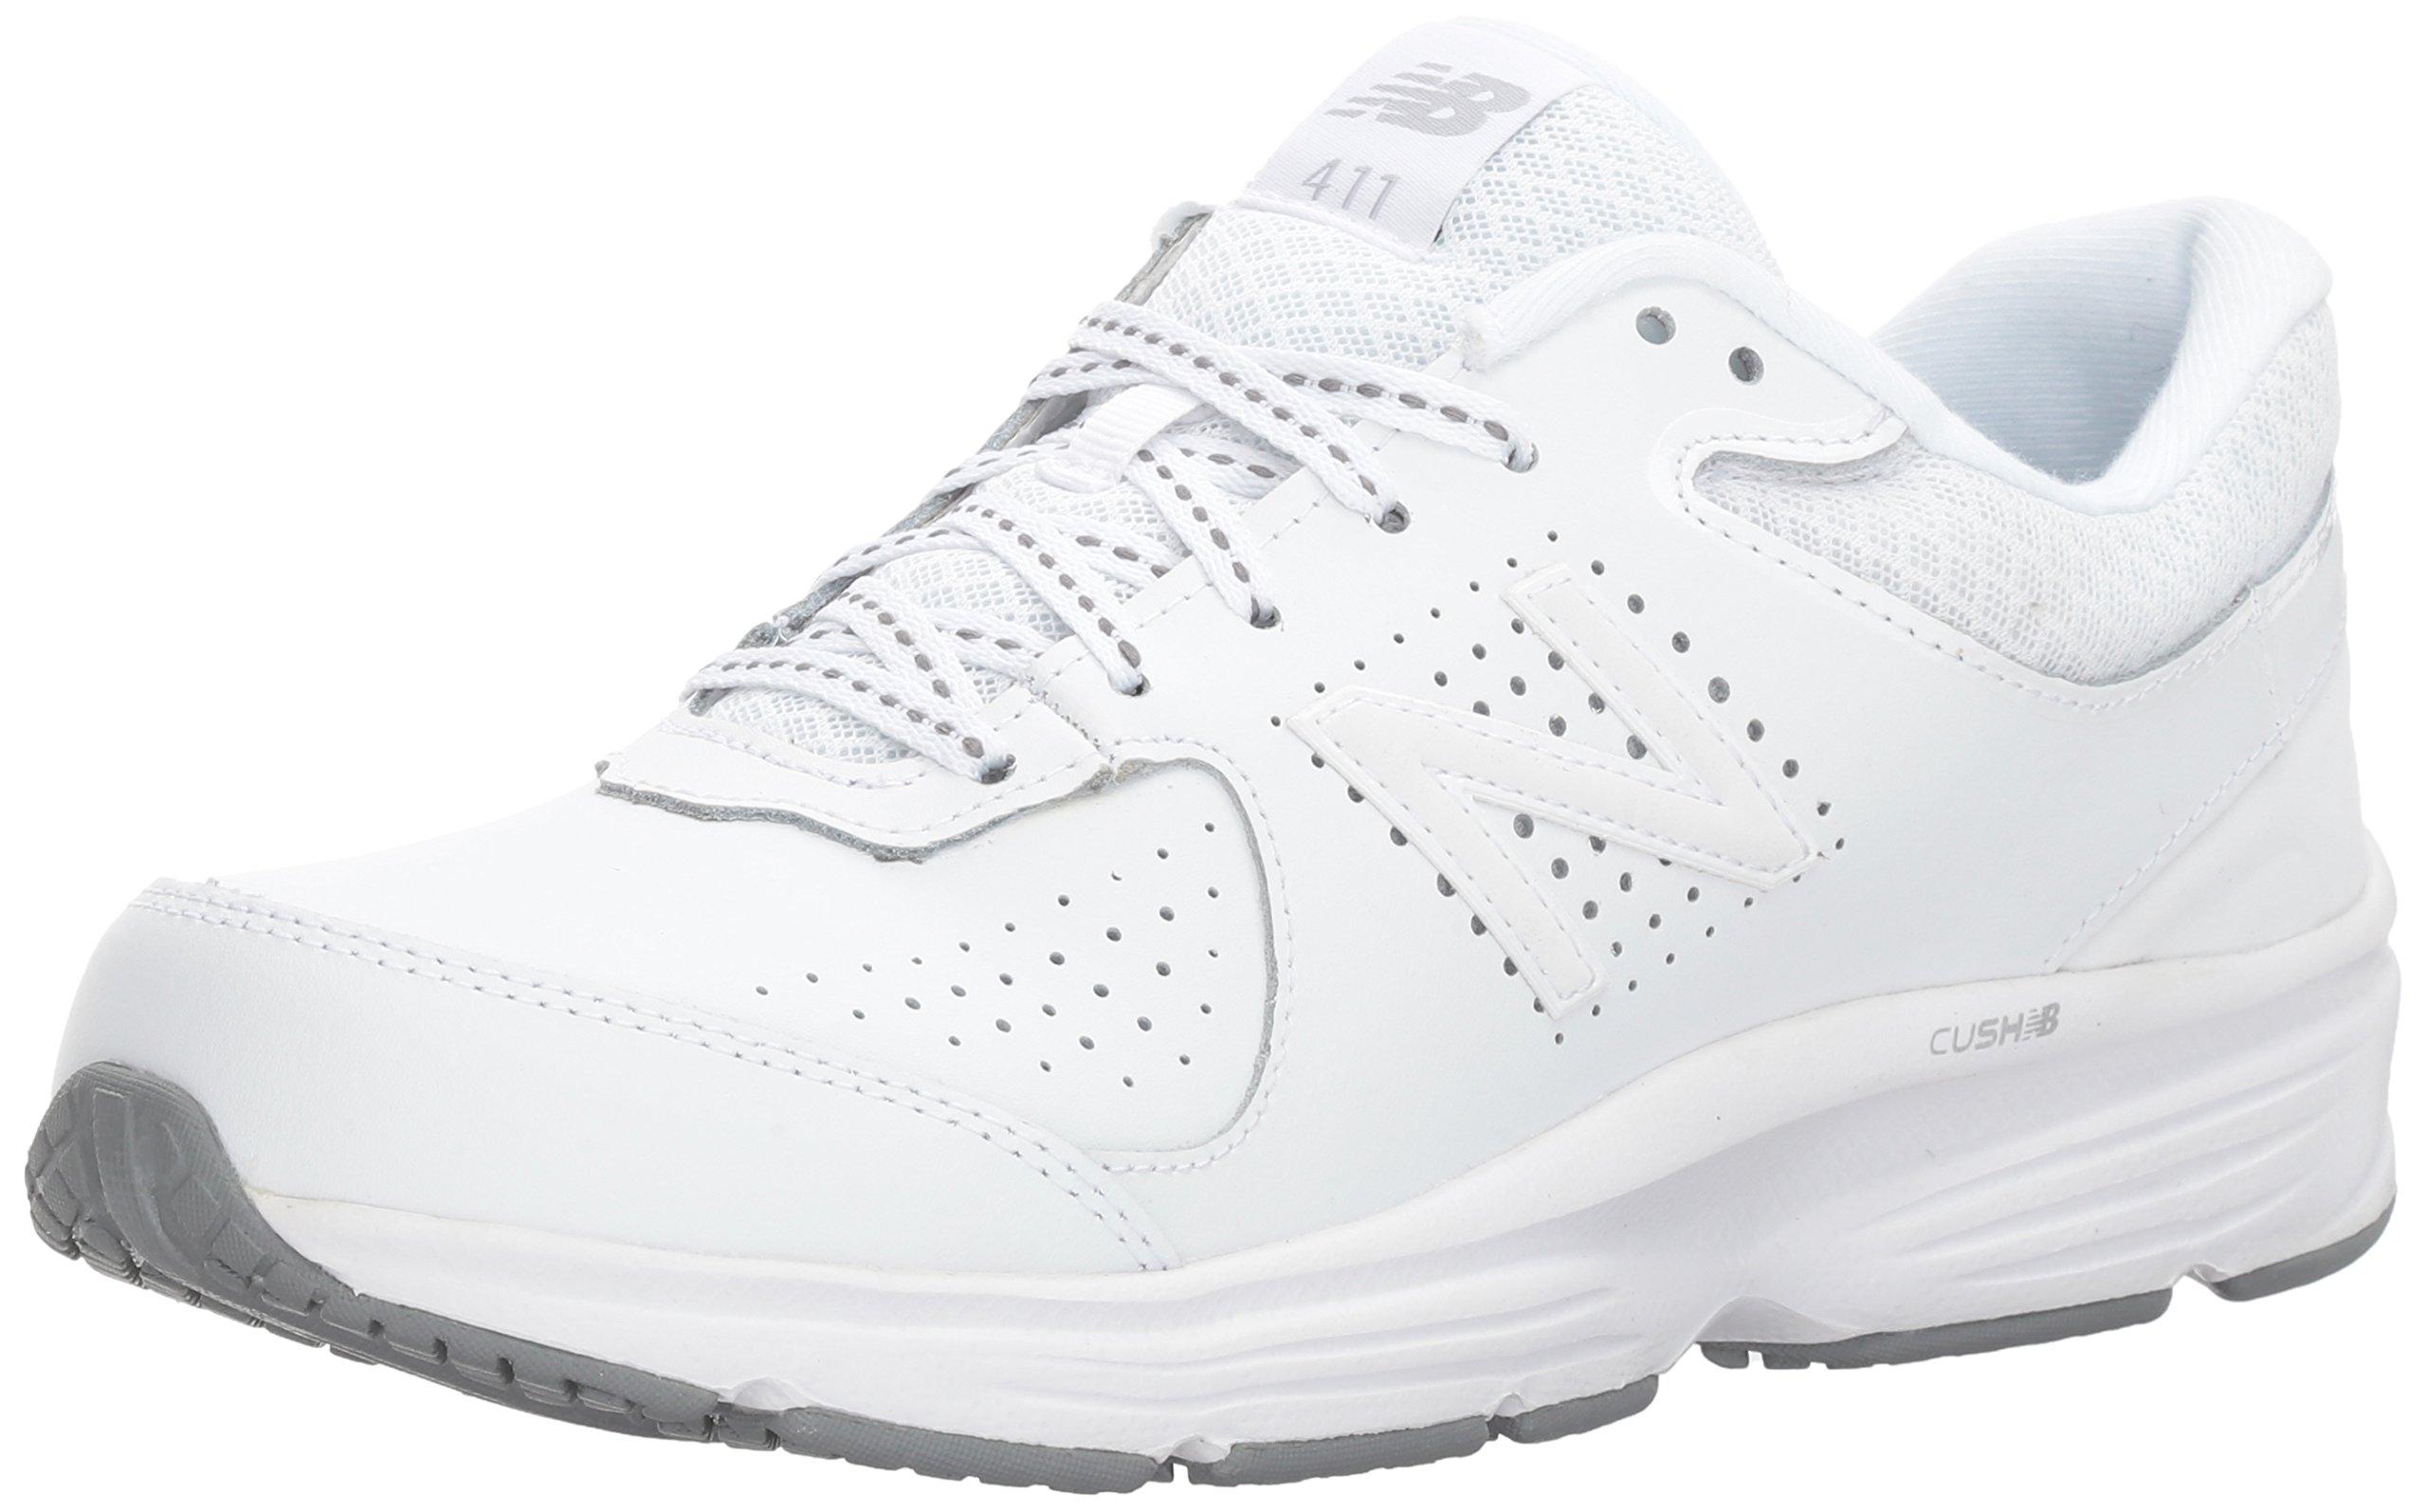 New Balance Women's WW411v2 Walking Shoe, White, 5.5 2A US